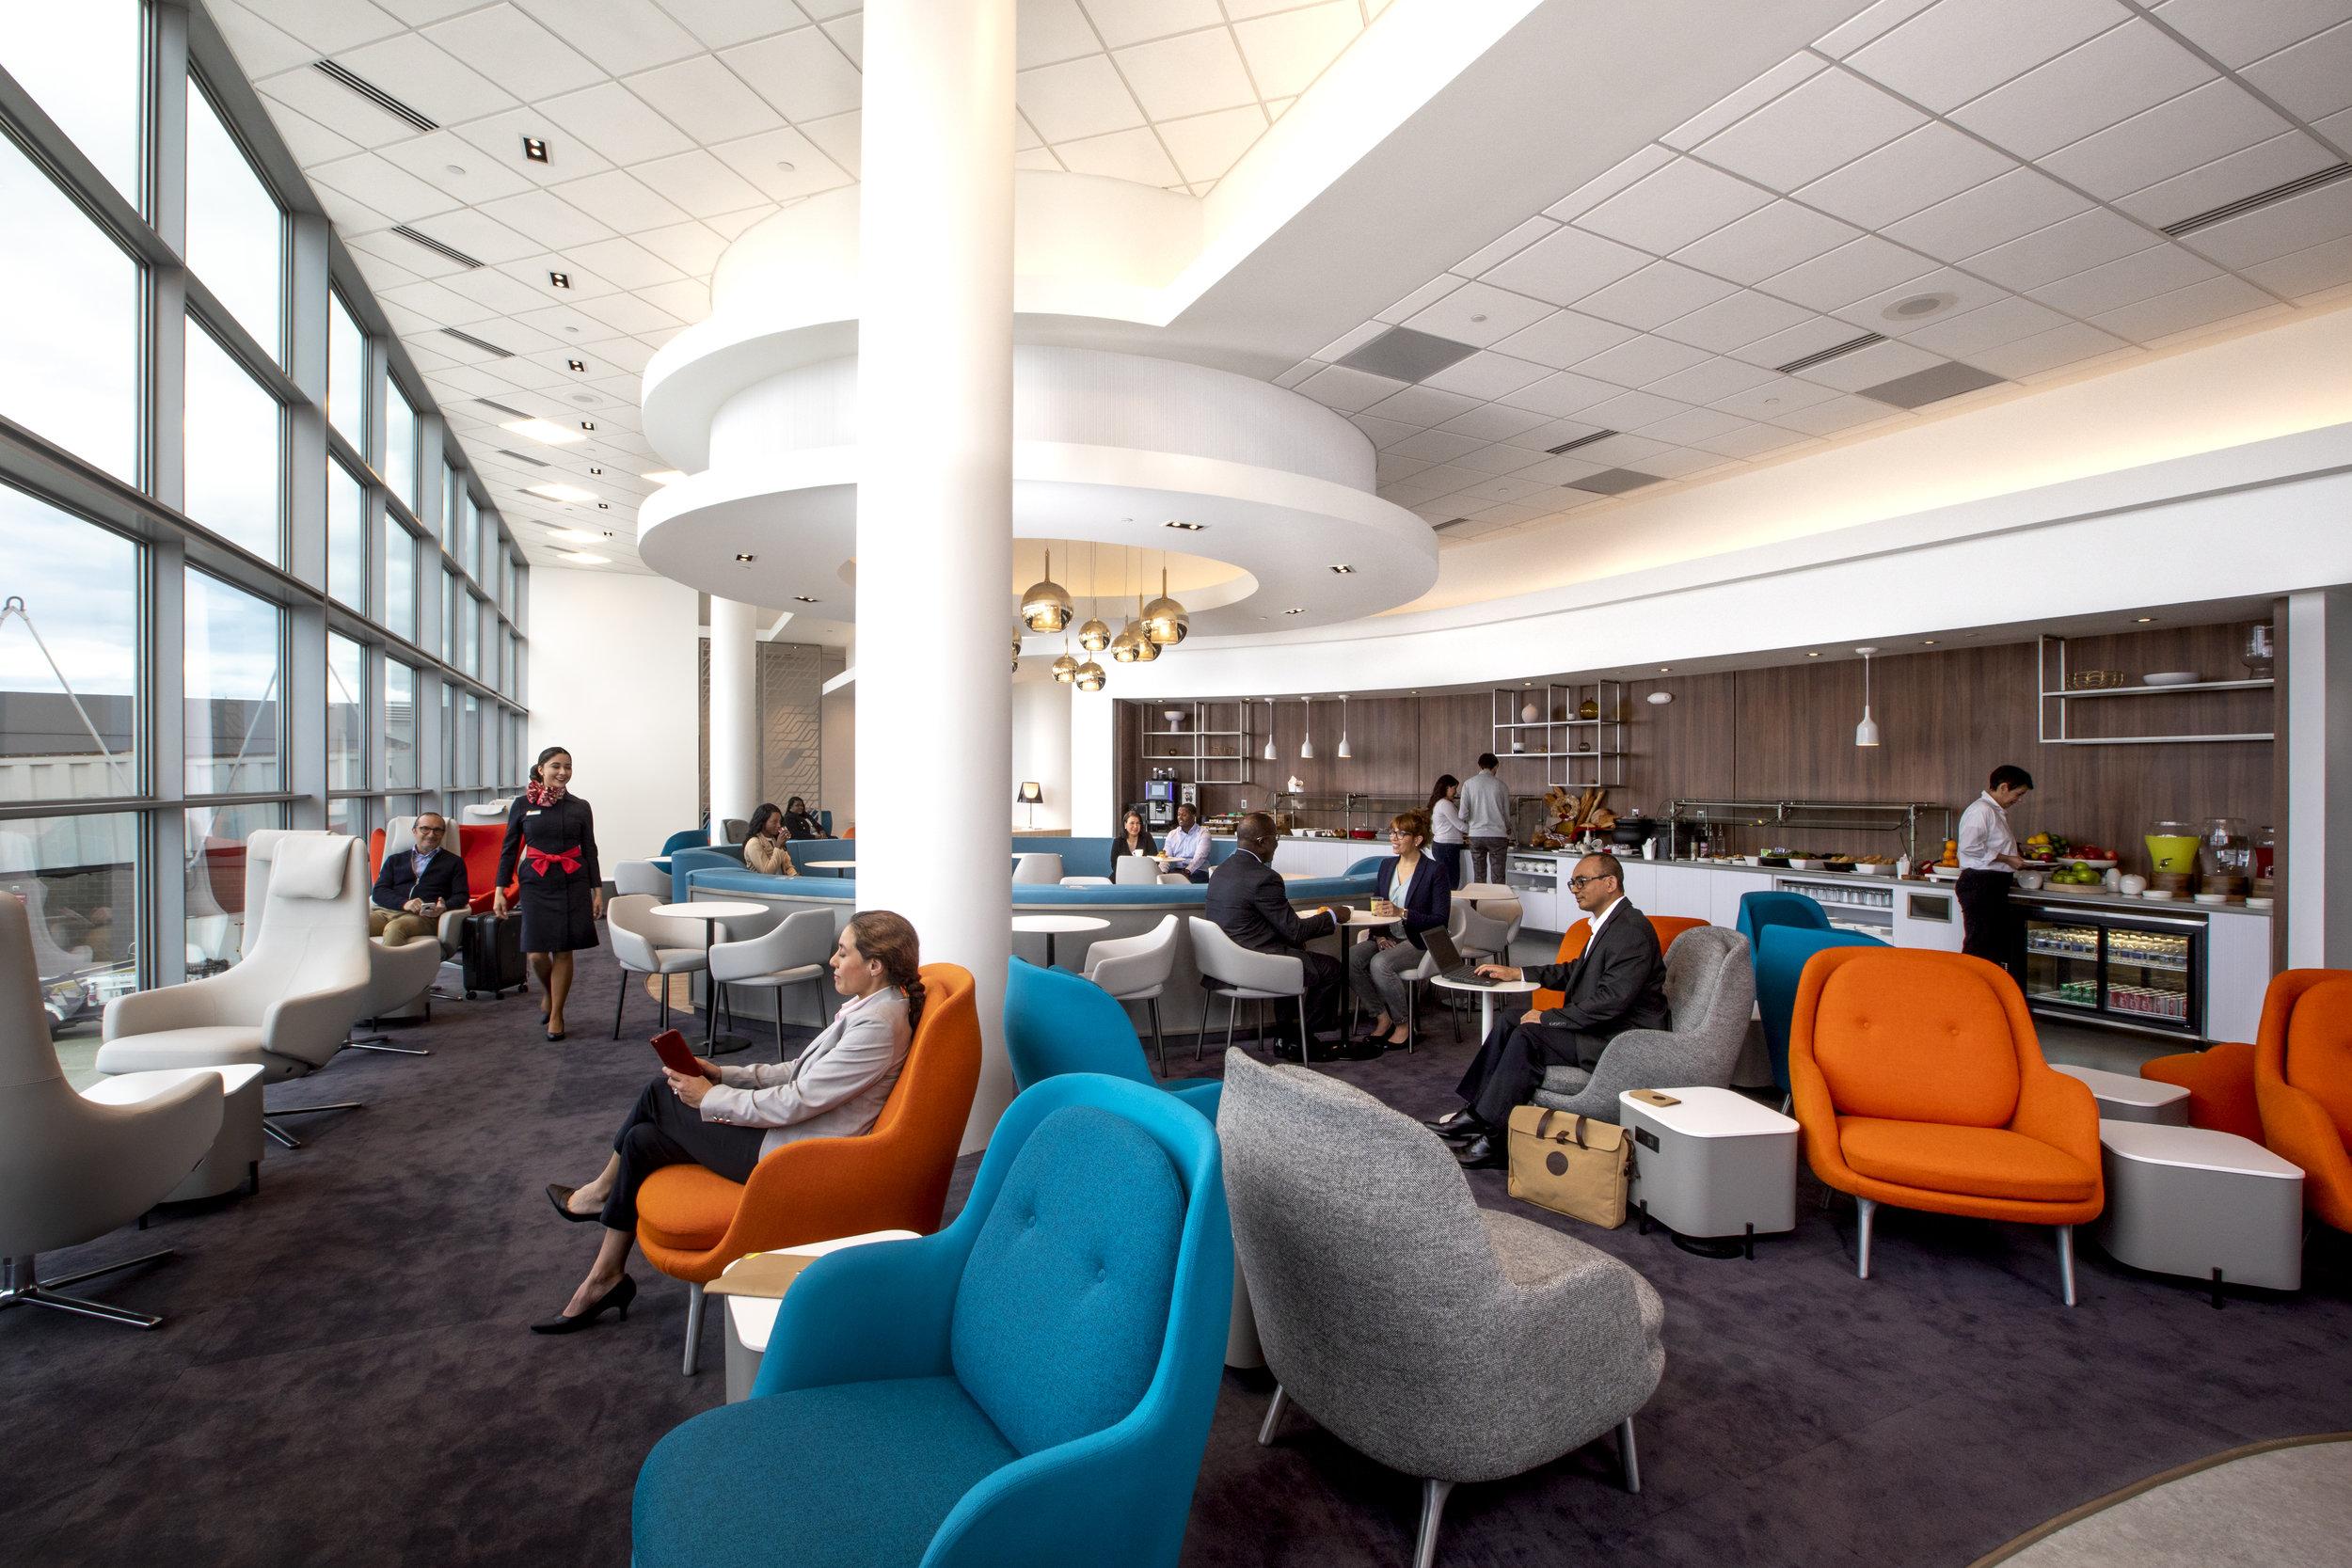 Air France Lounge Washington Dulles International Airport